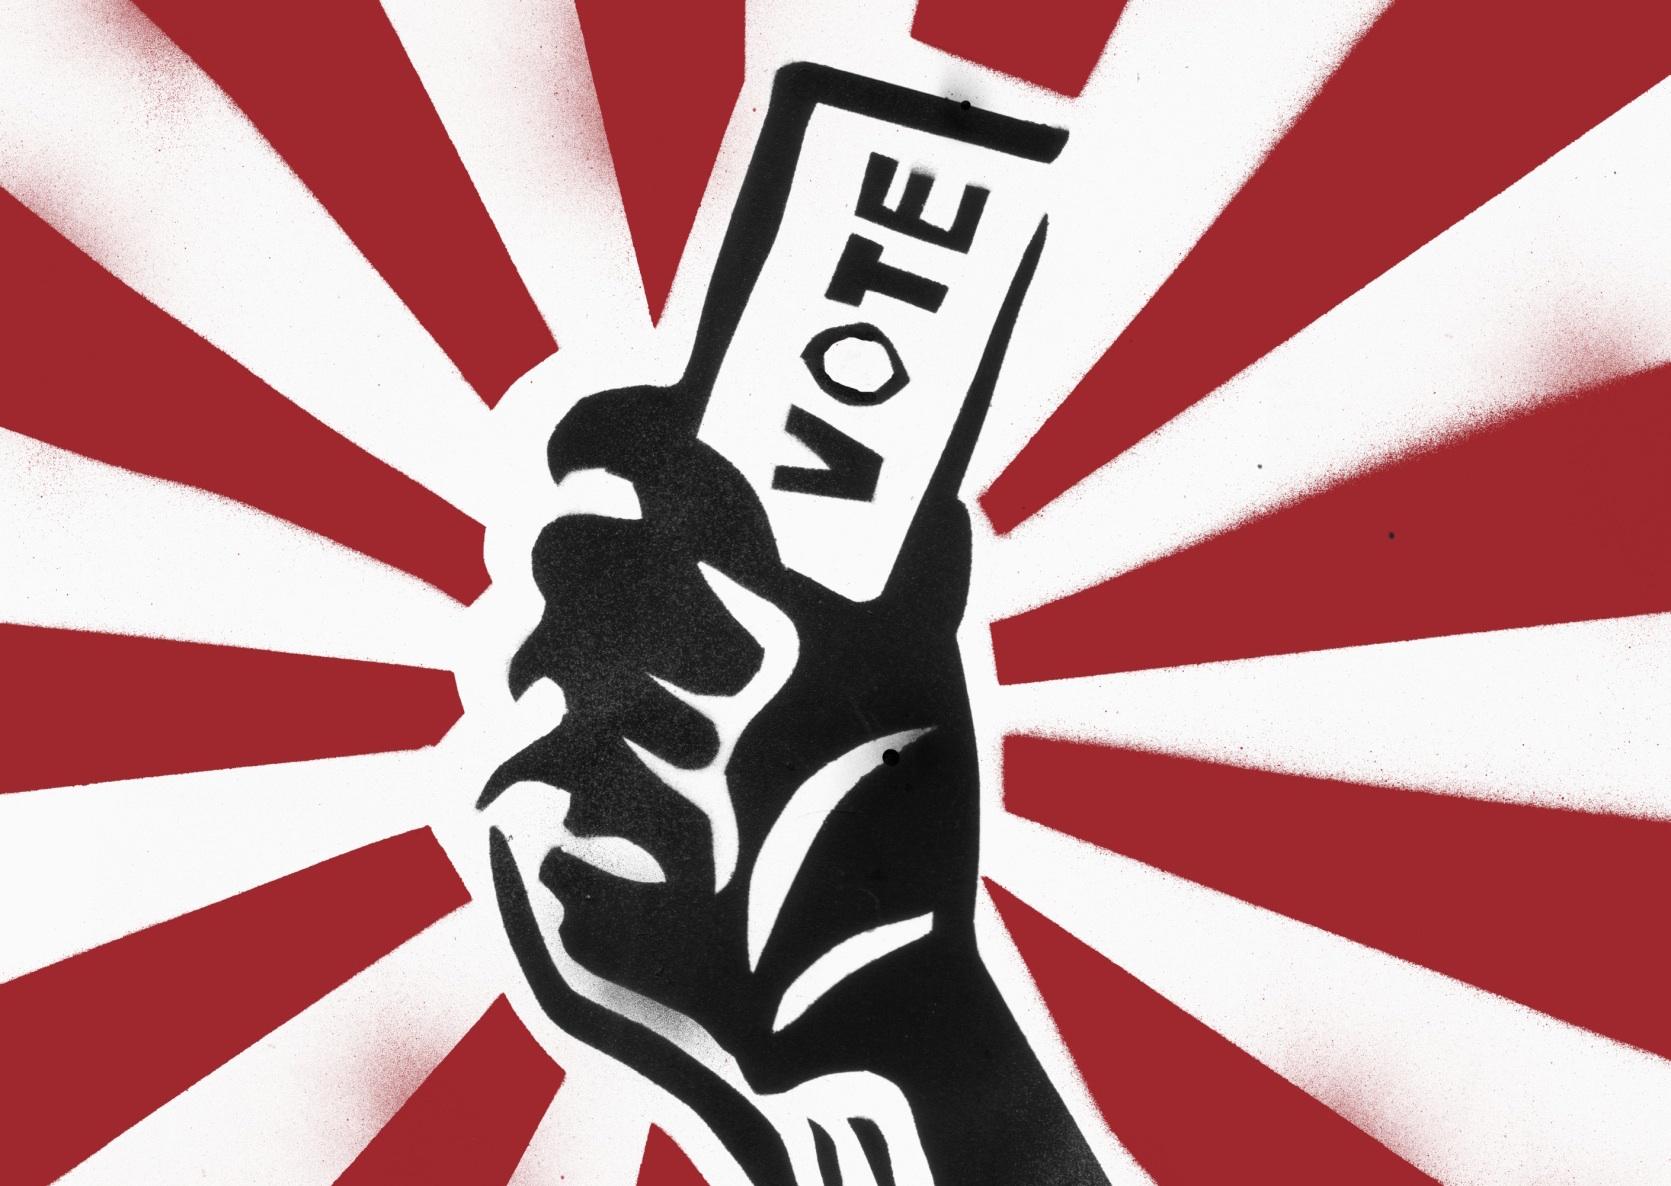 vote in Hastings and Rye